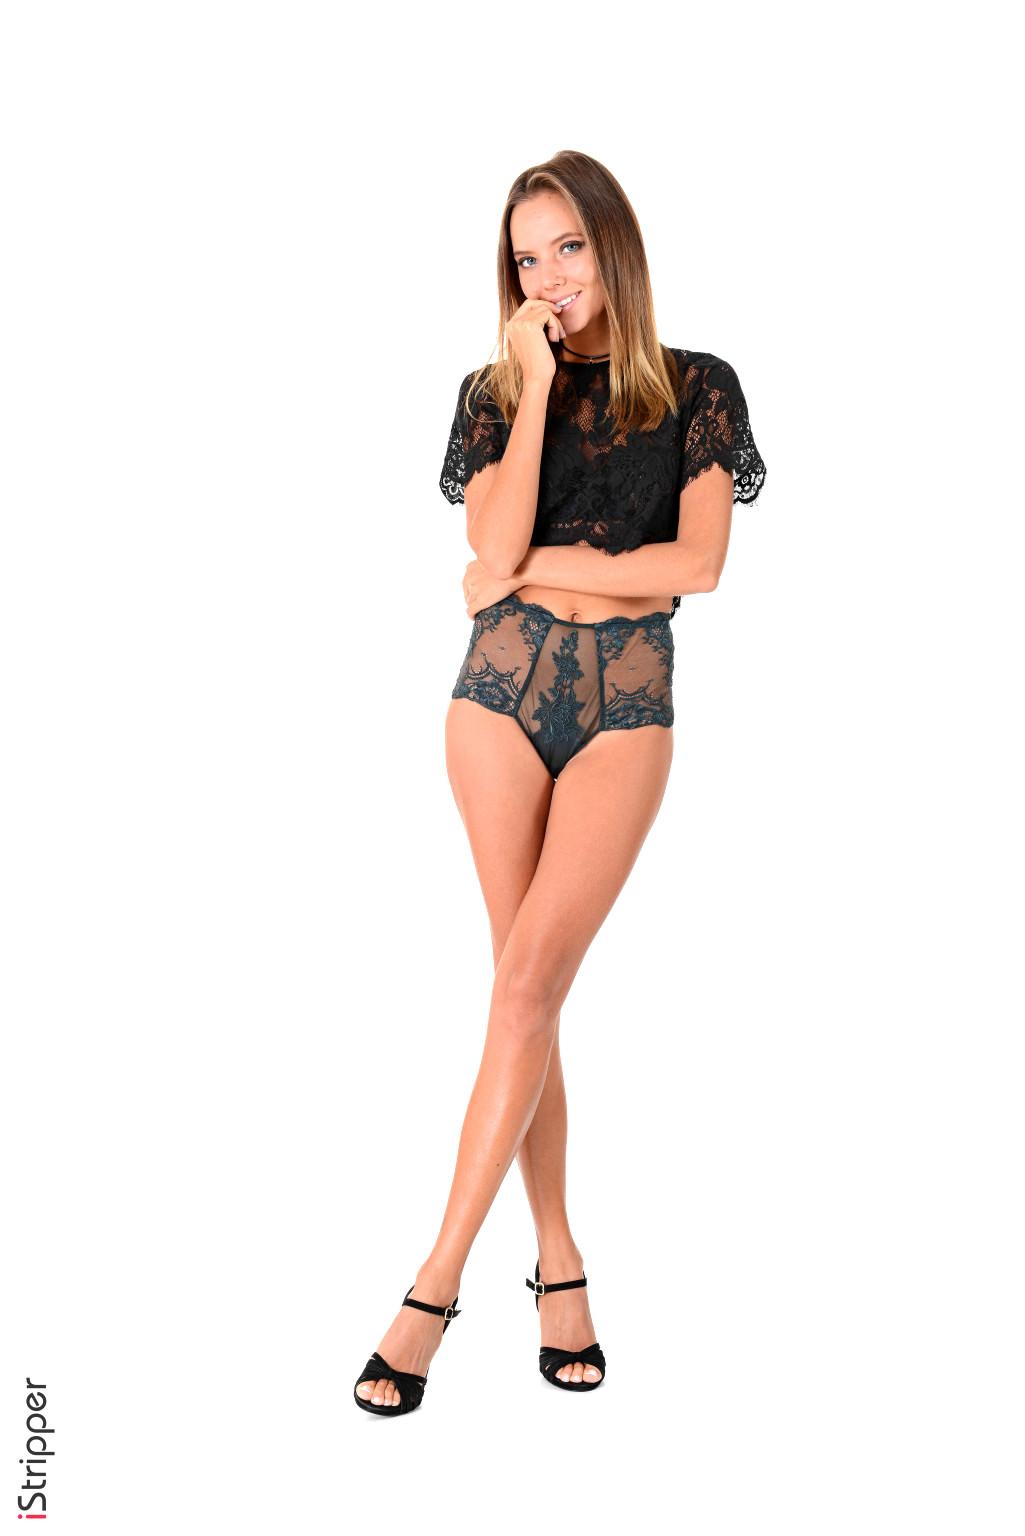 catherine zeta-jones naked session